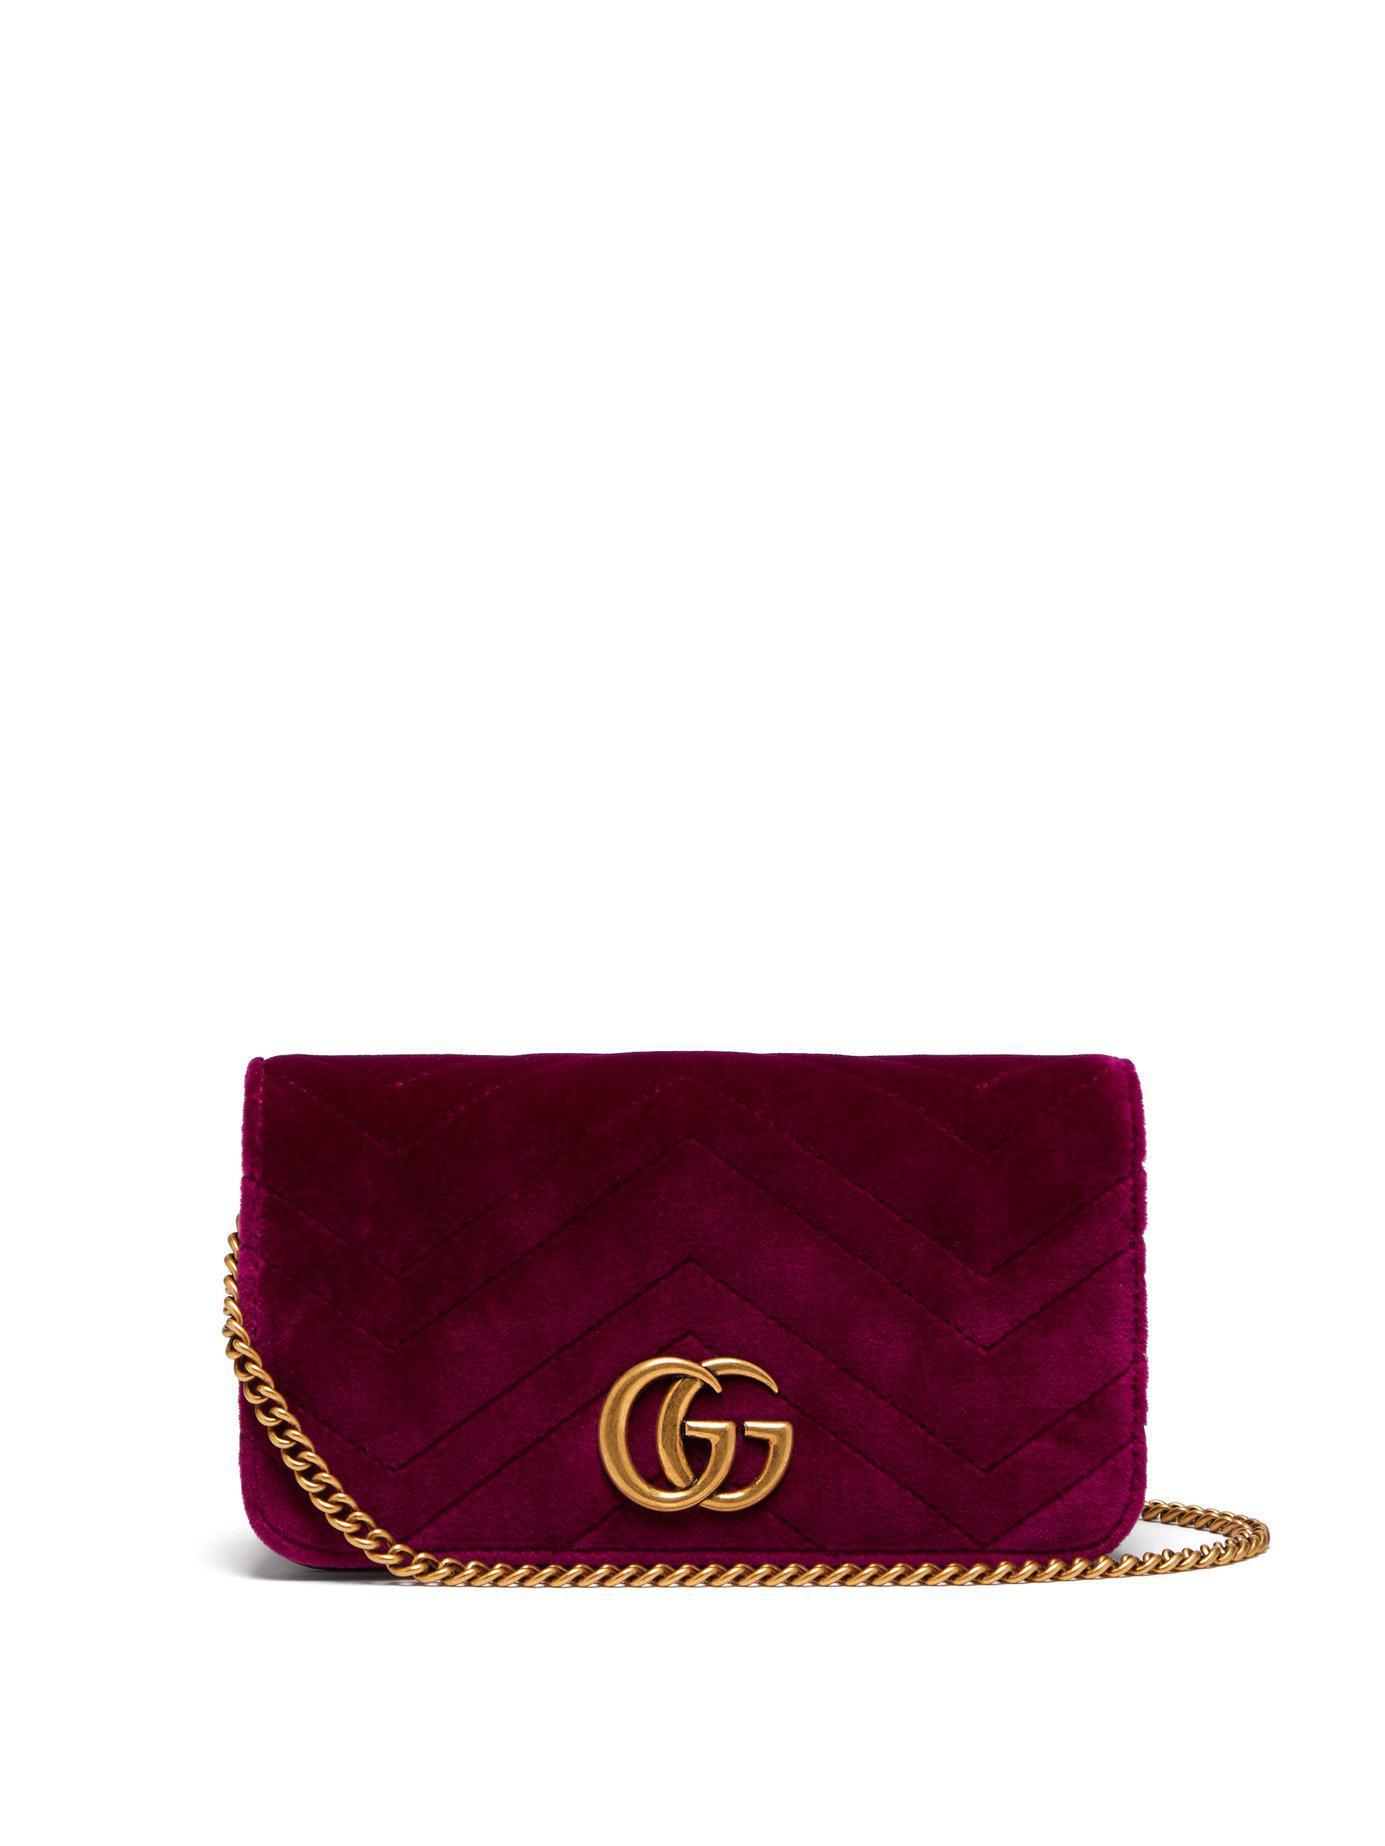 Gucci Marmont Gg Velvet Mini Cross Body Bag in Purple - Save ... 3b104c40f38ab